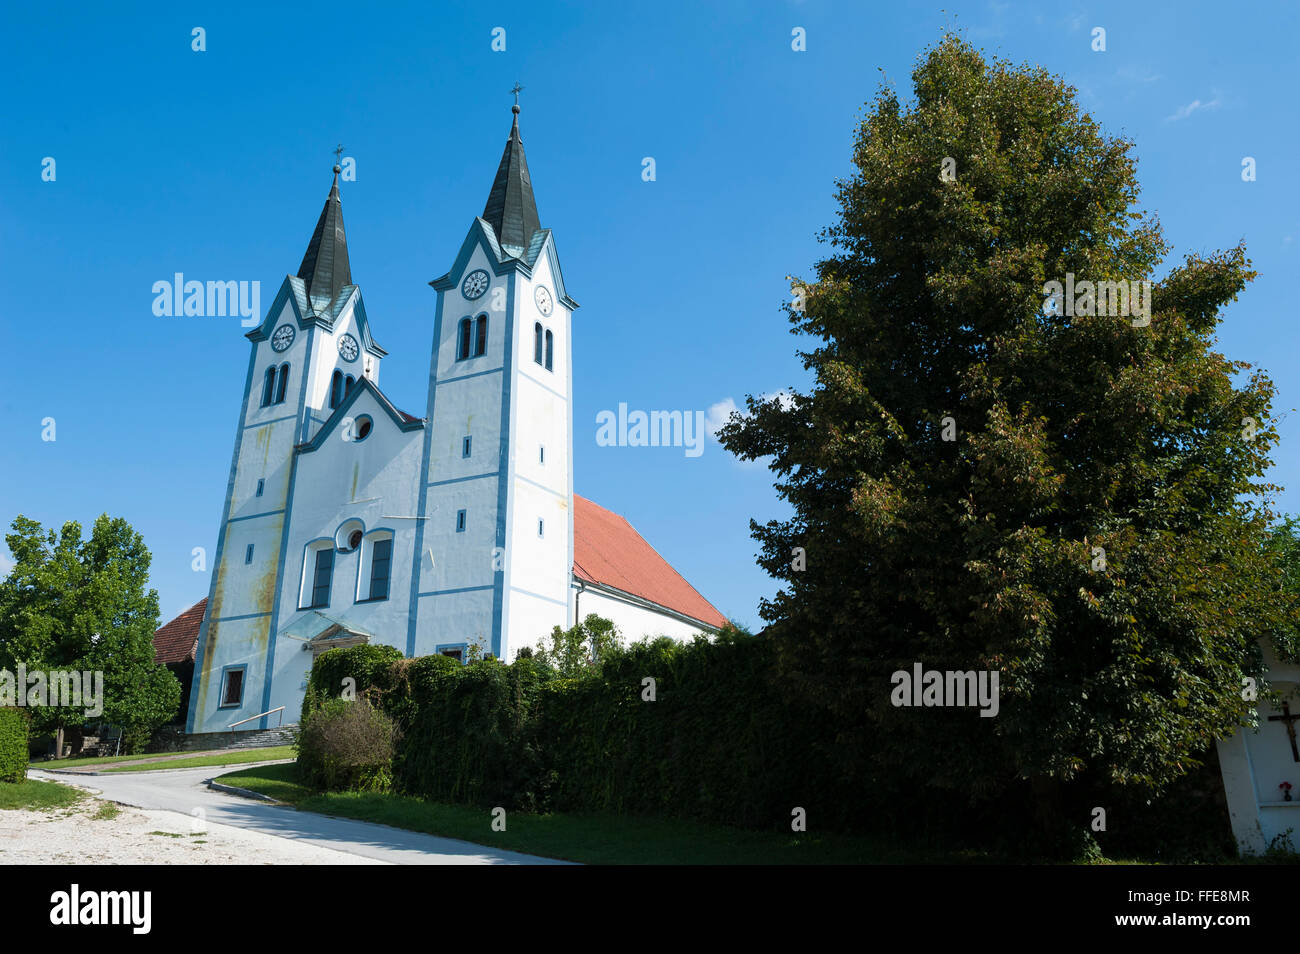 monastic church dedicated to Mary of Nazareth, Nazarje, Savinja Statistical region, Styria, Slovenia, Europe - Stock Image